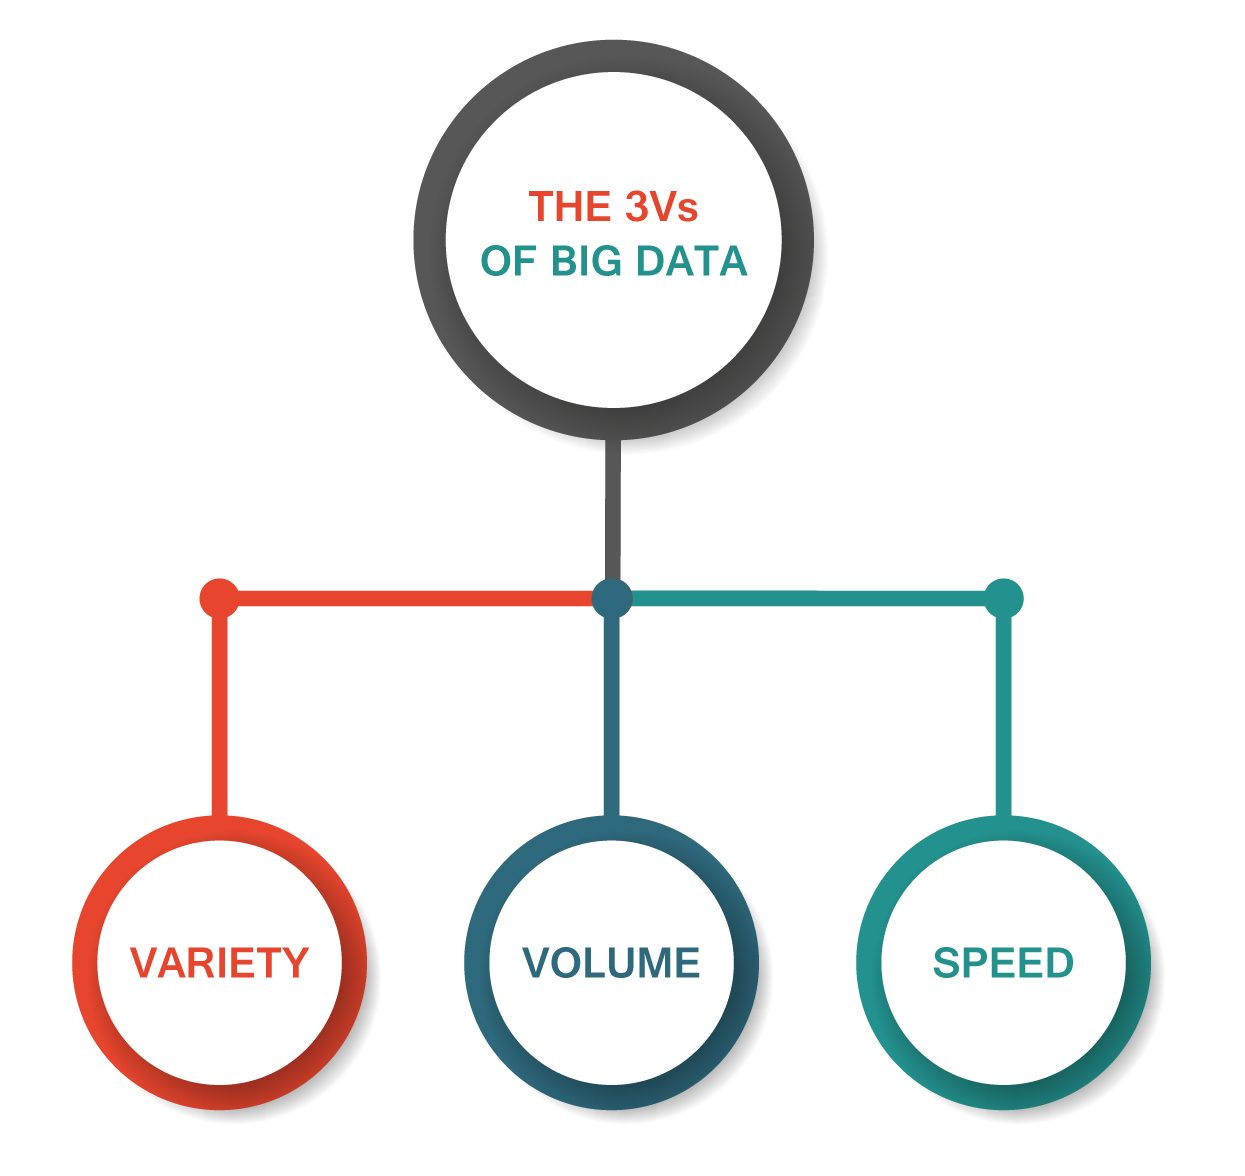 The 3VS Of Big Data Image